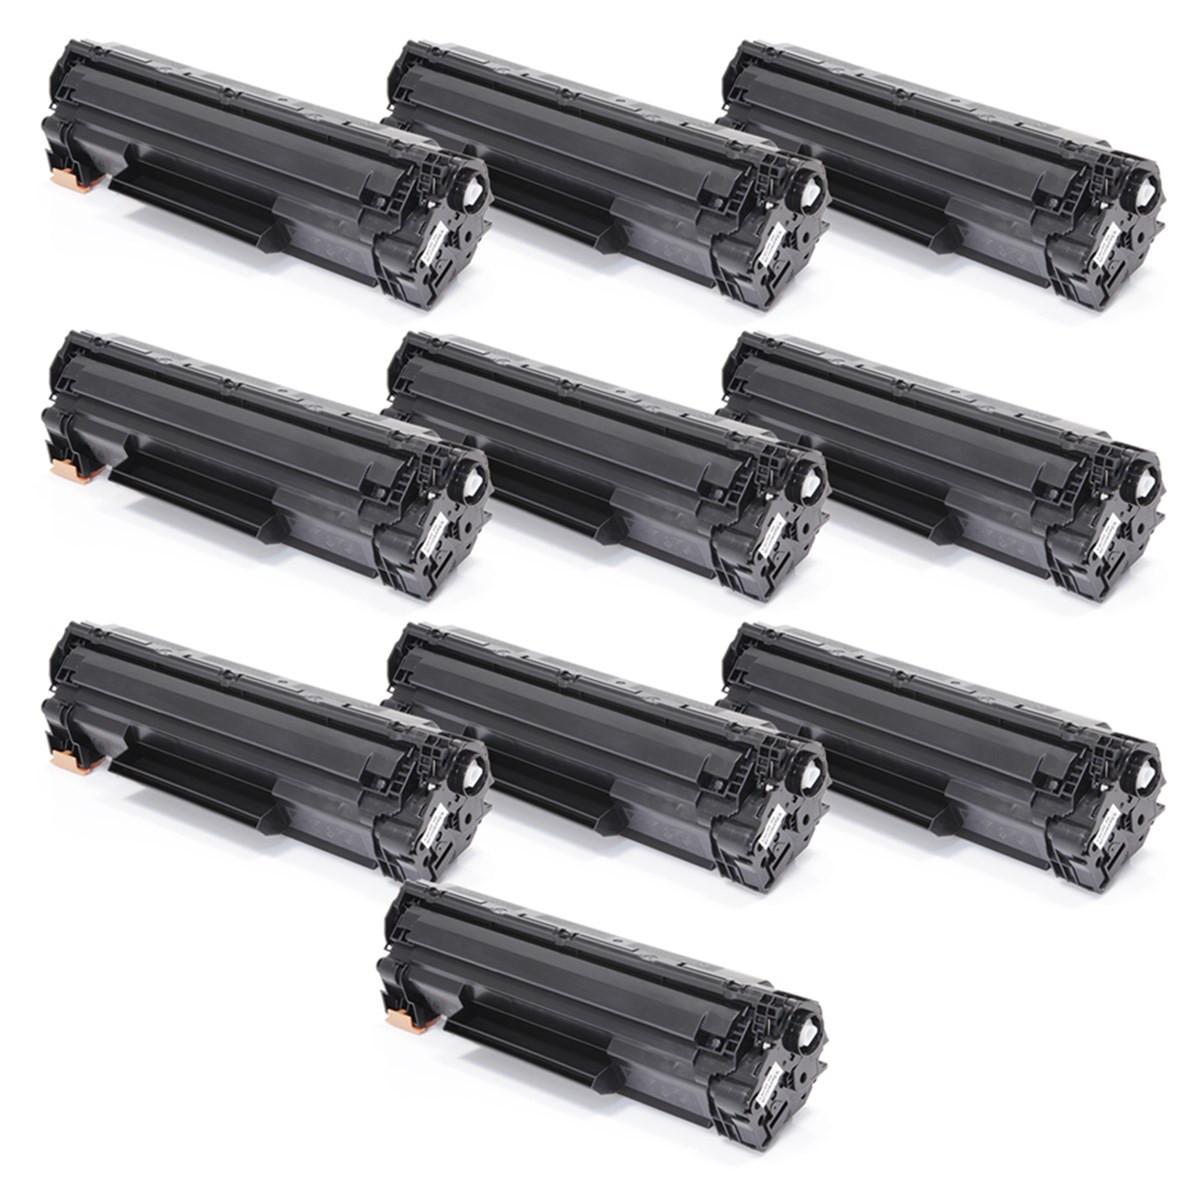 Kit com 10 Toner Compatível com HP CB435A 35A 435A CB435AB | LaserJet P1005 P1006 | Premium 1.8k